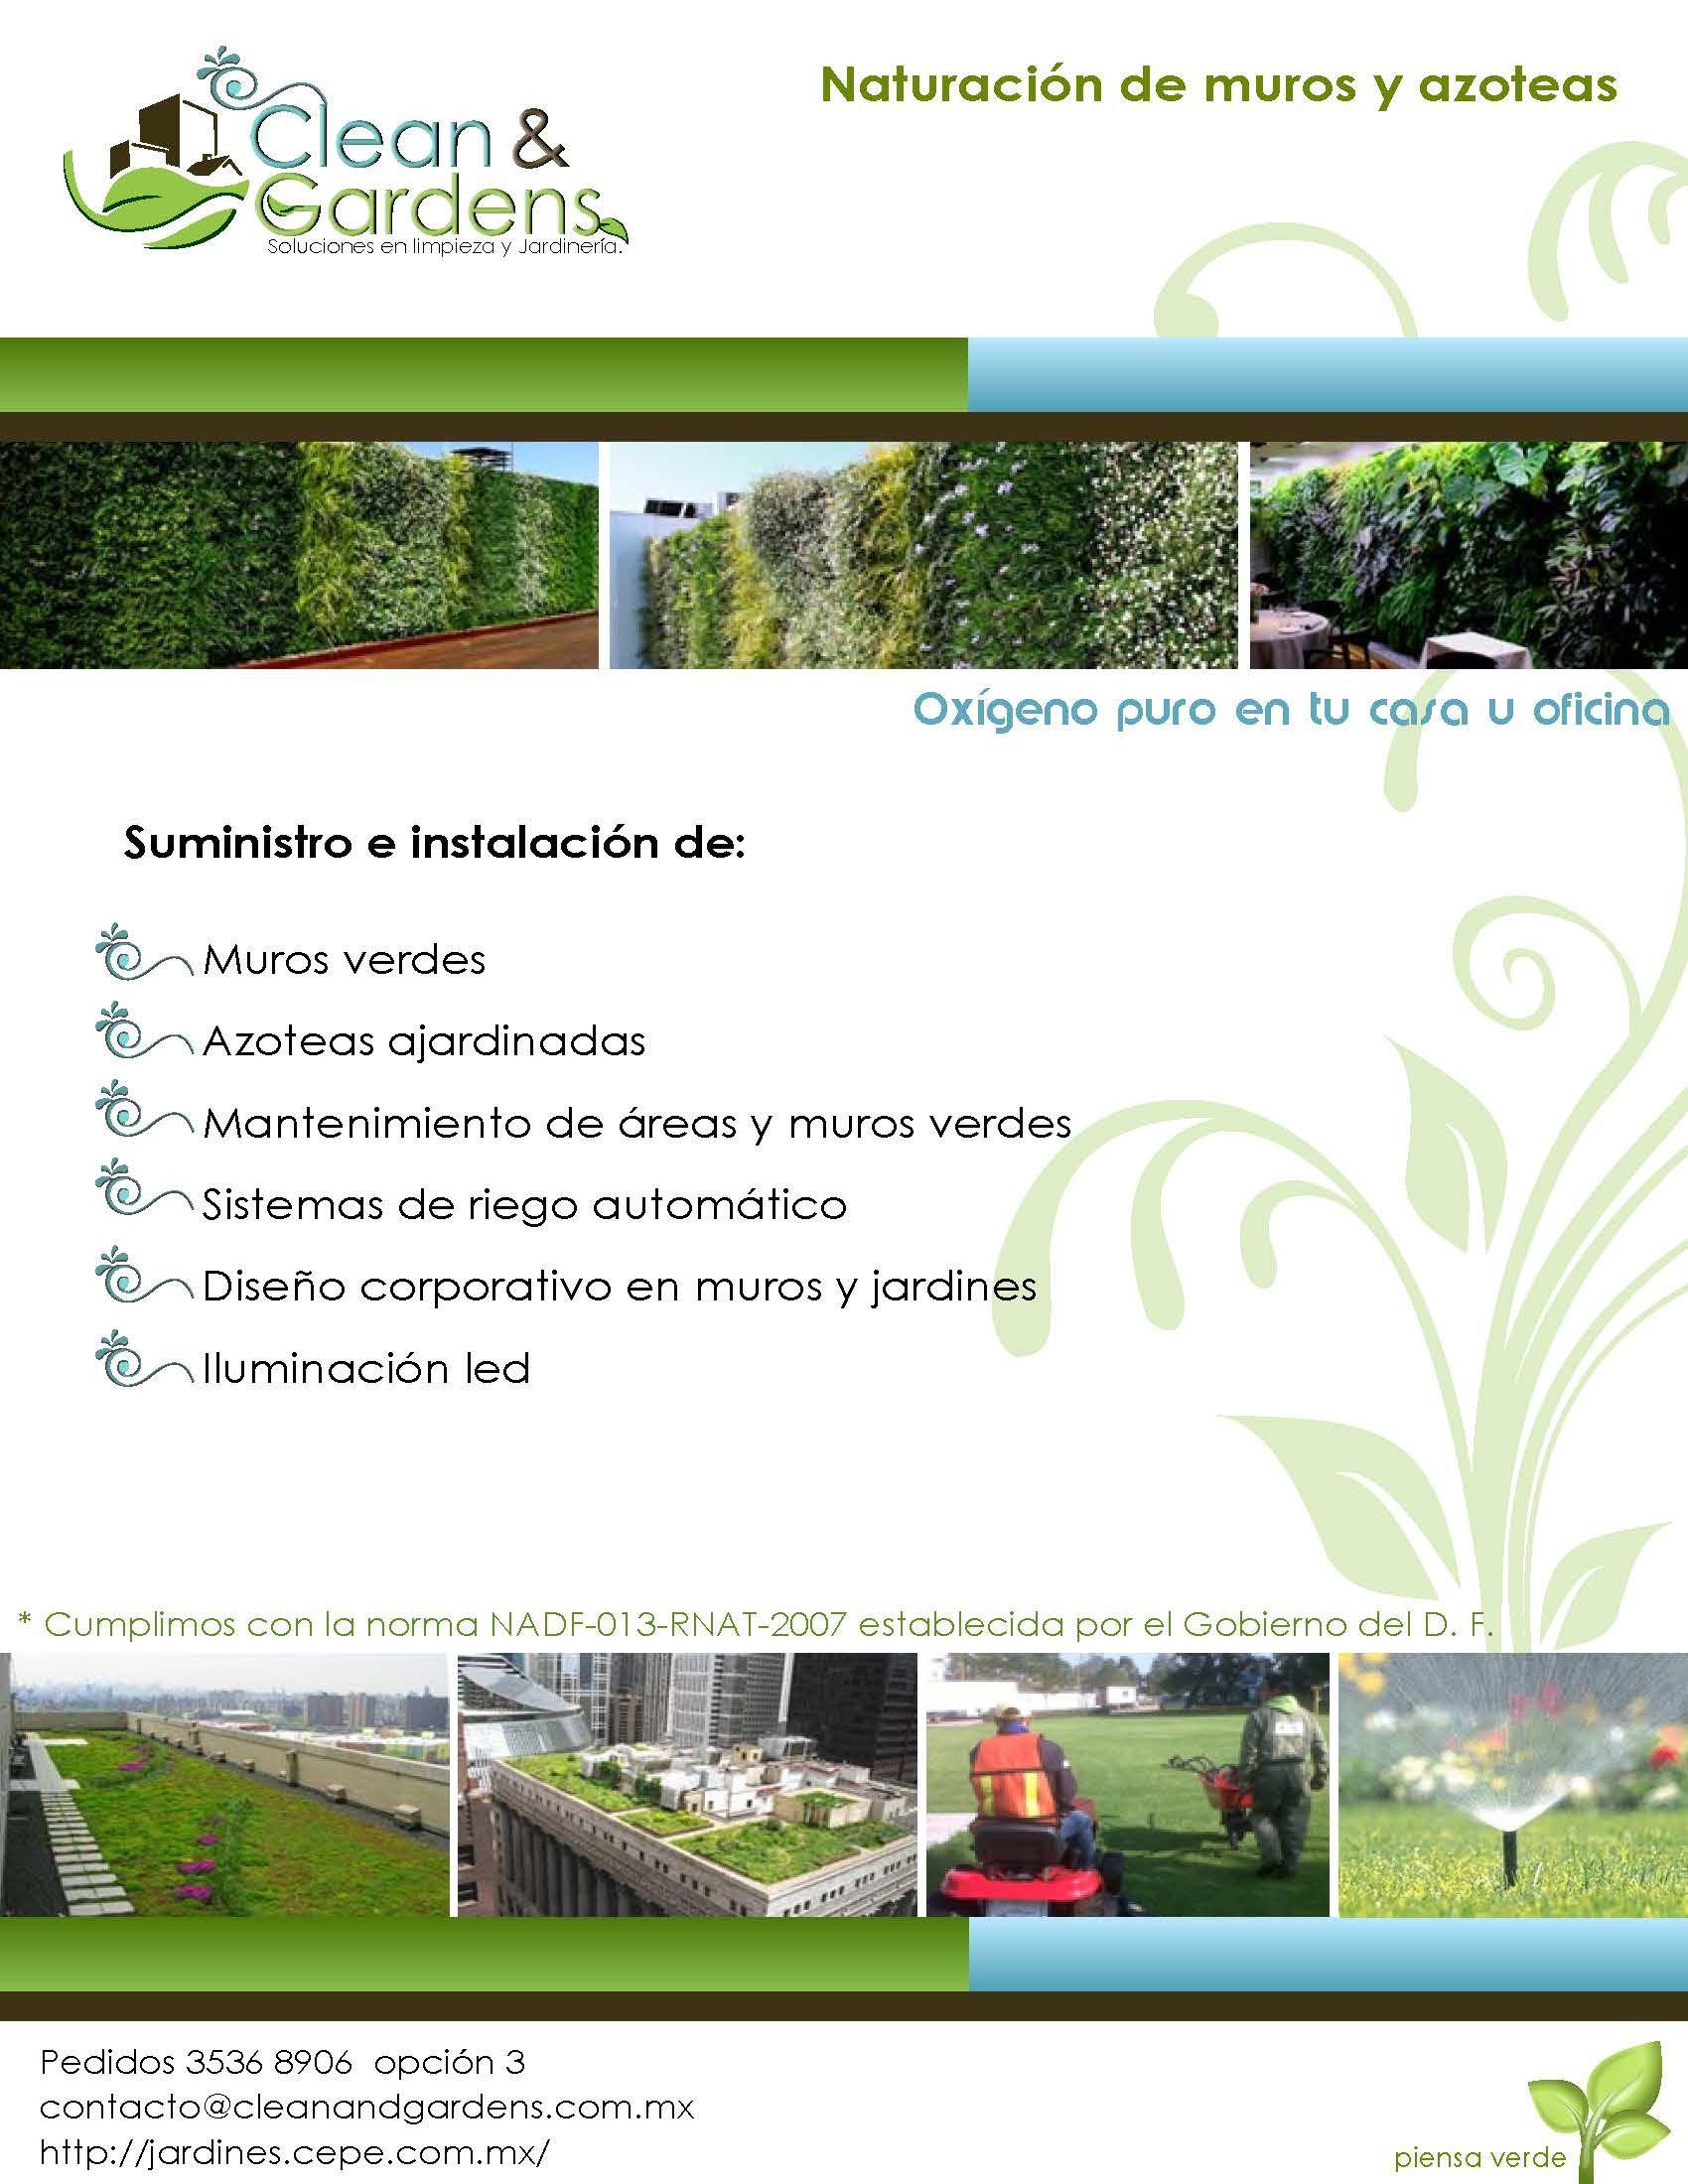 Muro Verde, Azotea Ajardinada